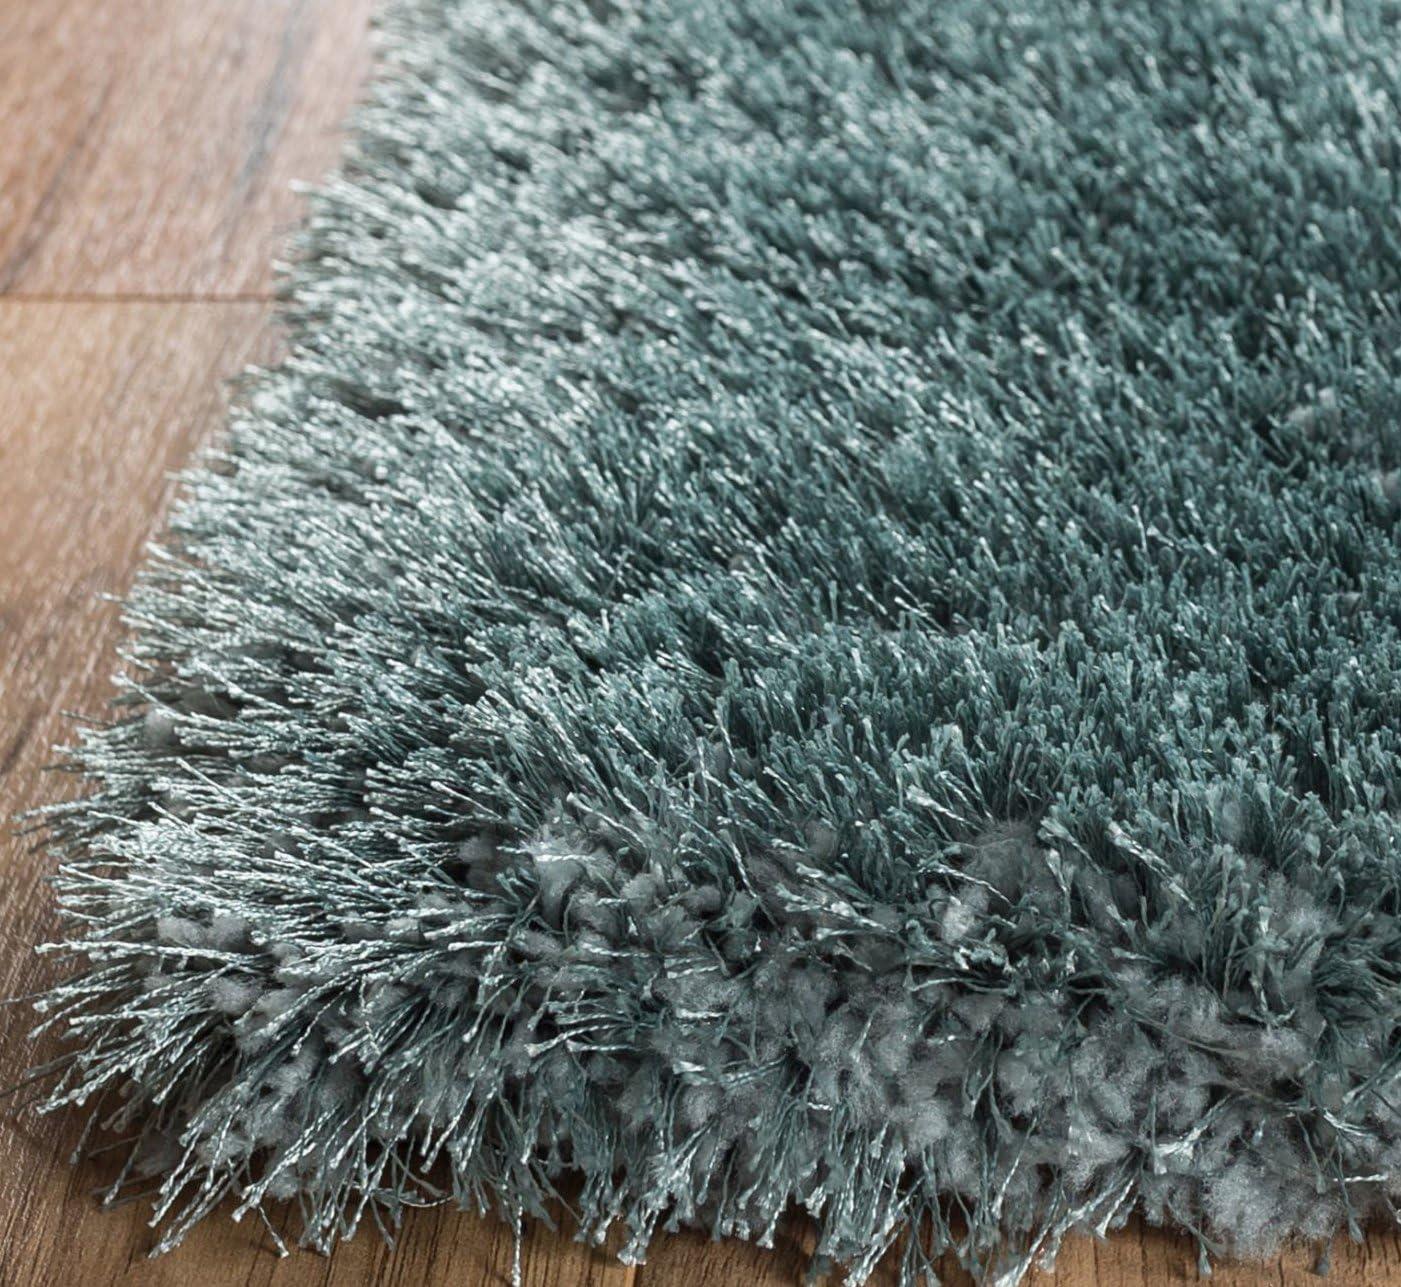 Home Way Premium Quality Blue Super Thick Plush Shag Area Rug 7'10″ x 9'10″ 8